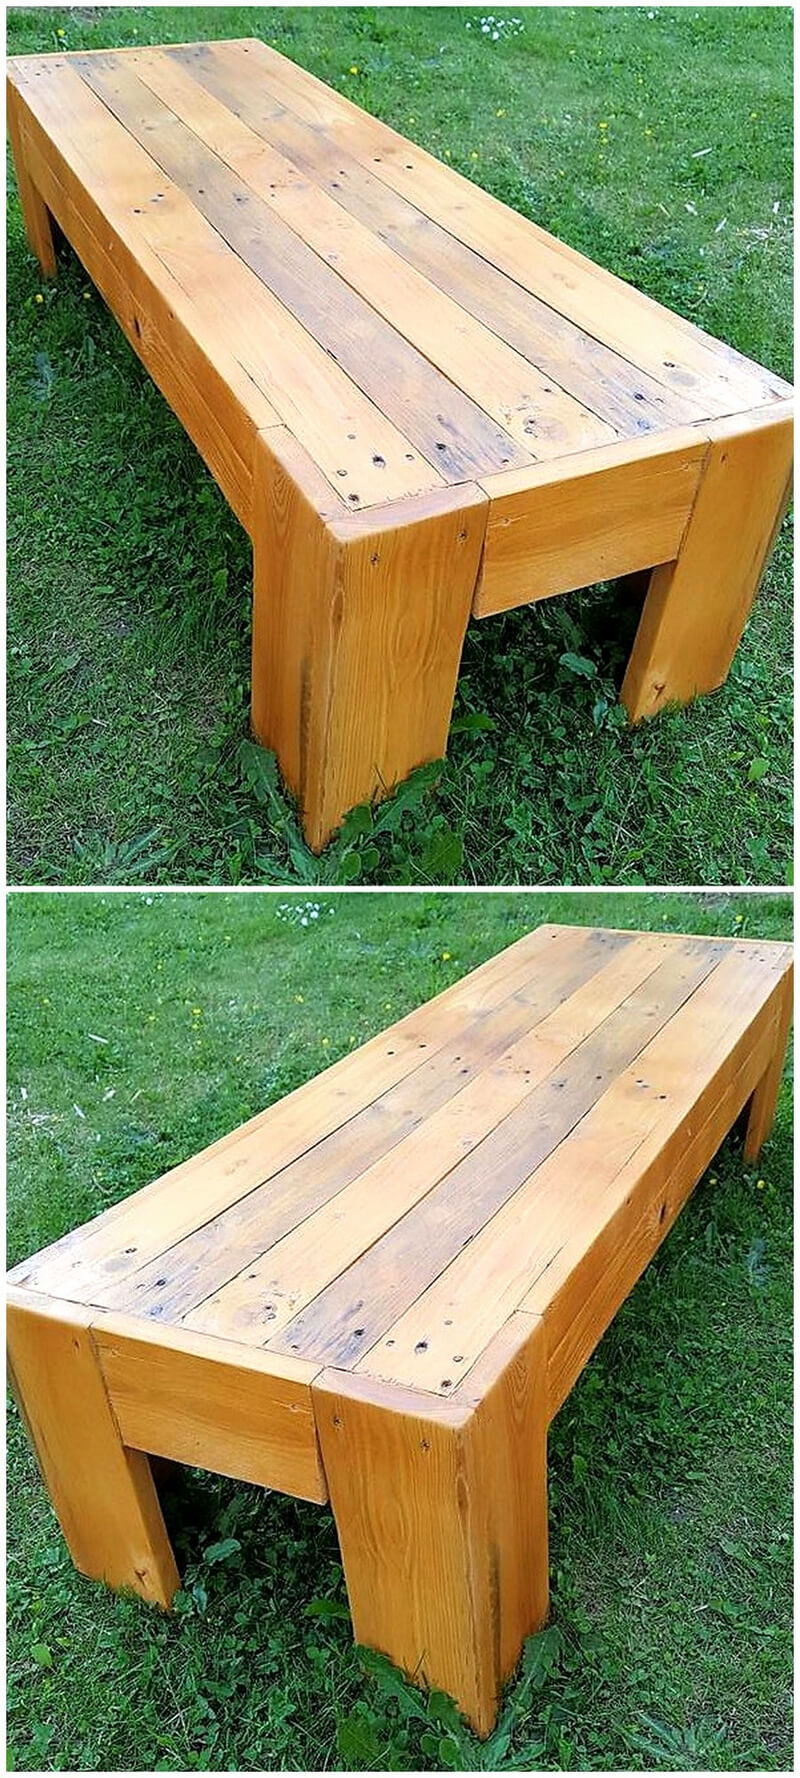 Patio En Bois De Palette recycle and reuse ideas for used wood pallets | wood pallet